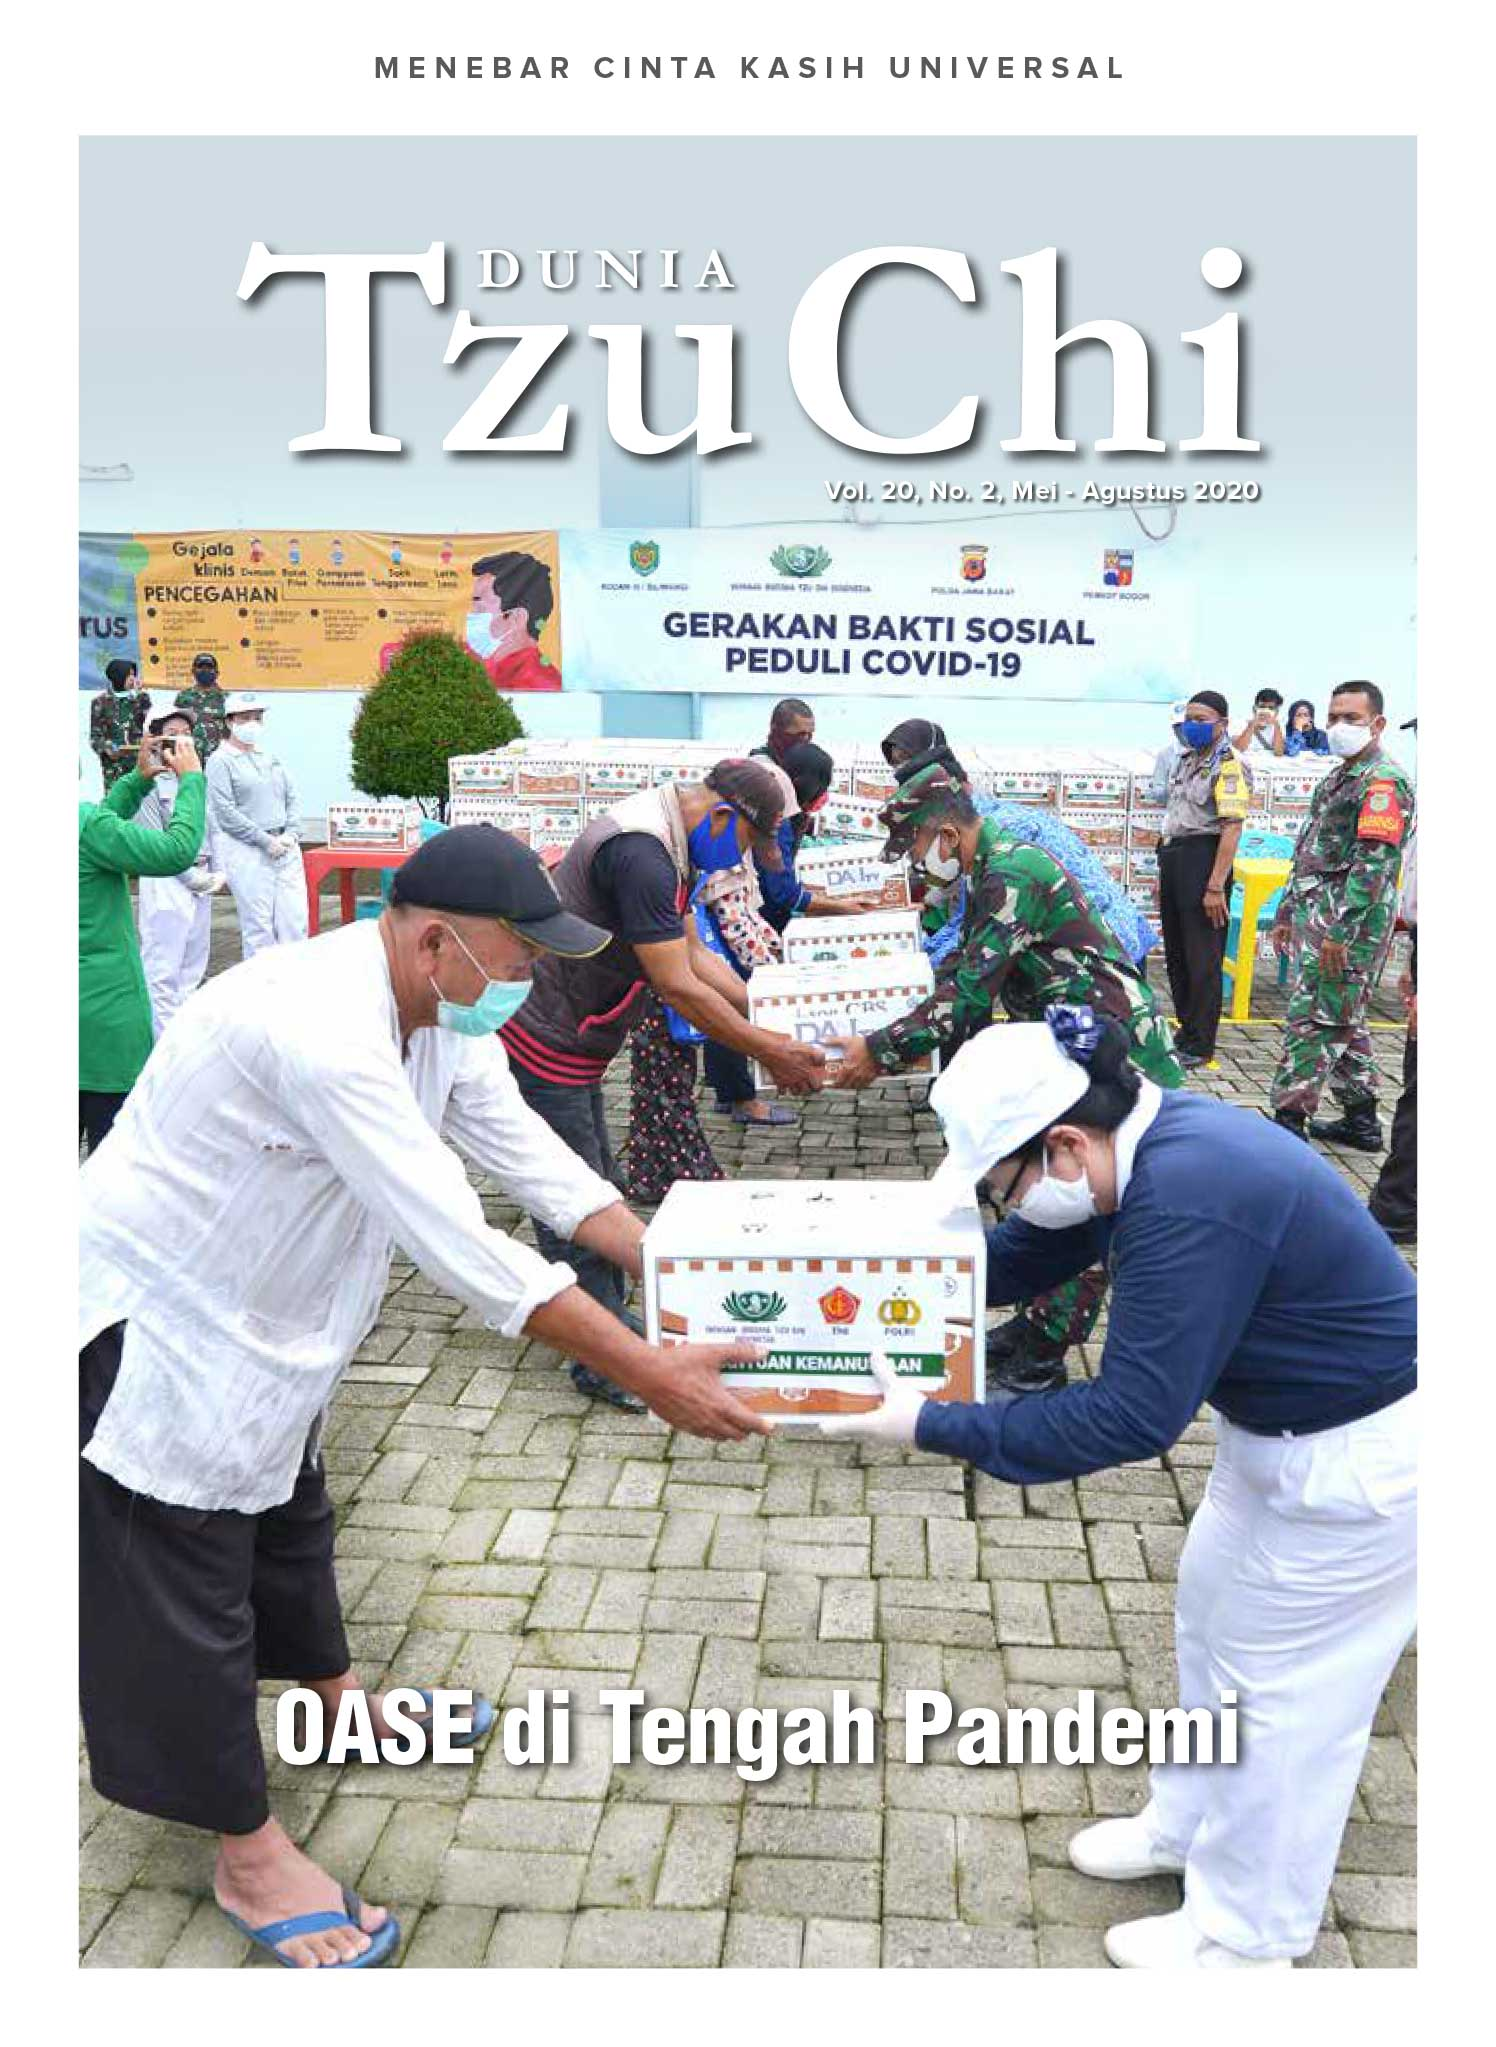 Majalah Dunia Tzu Chi Mei-Agustus 2020